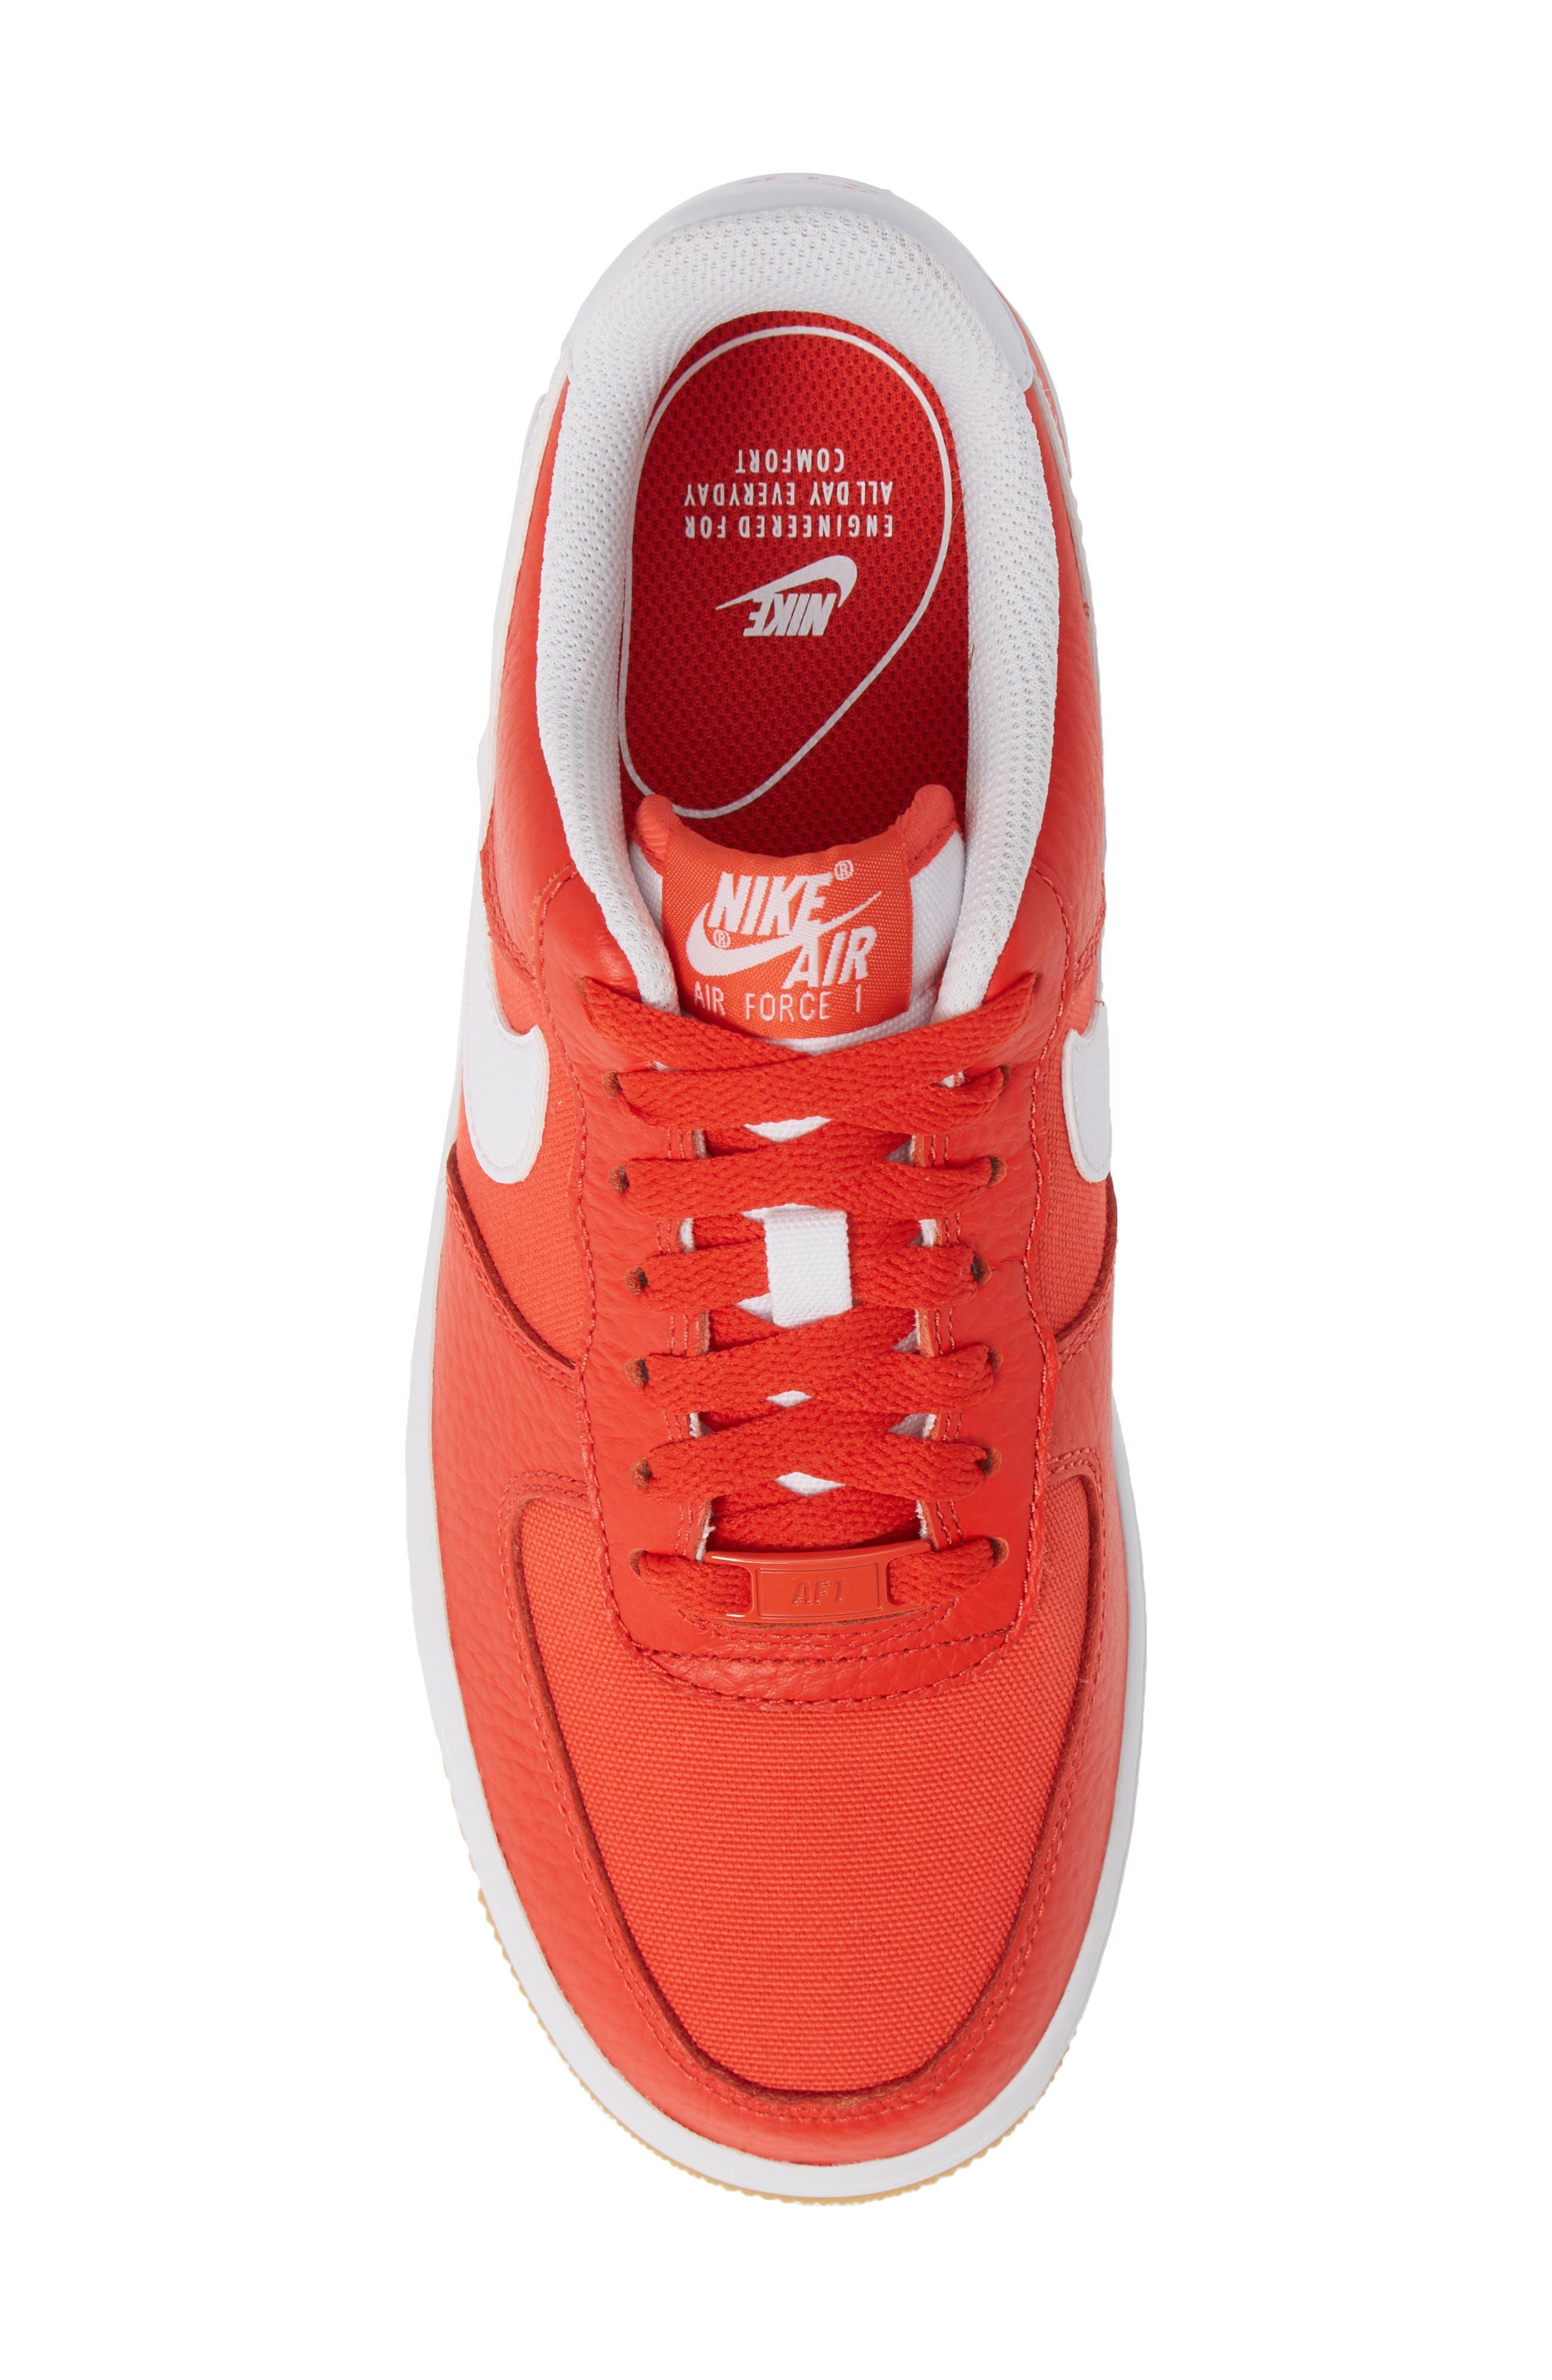 Air Force 1 '07 Premium Sneaker,                             Alternate thumbnail 5, color,                             Red/ White/ Light Brown